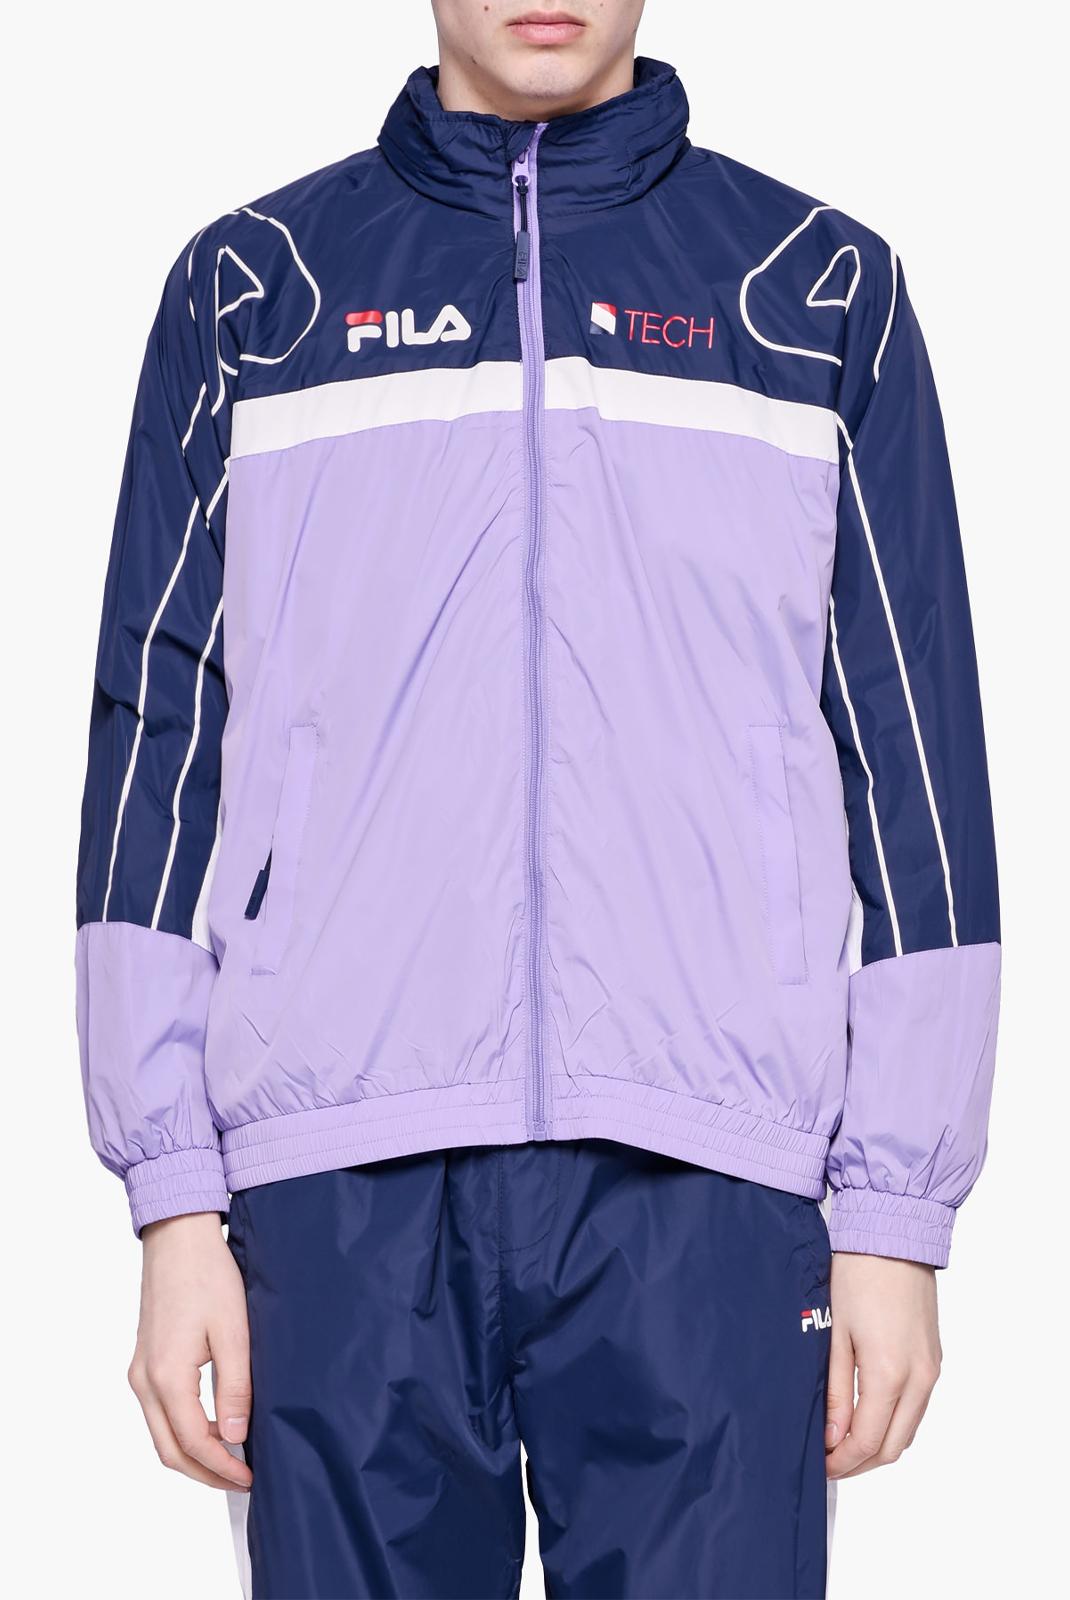 Vestes zippées  Fila 687013 DAN A074 violet tulip-black iris-bright white